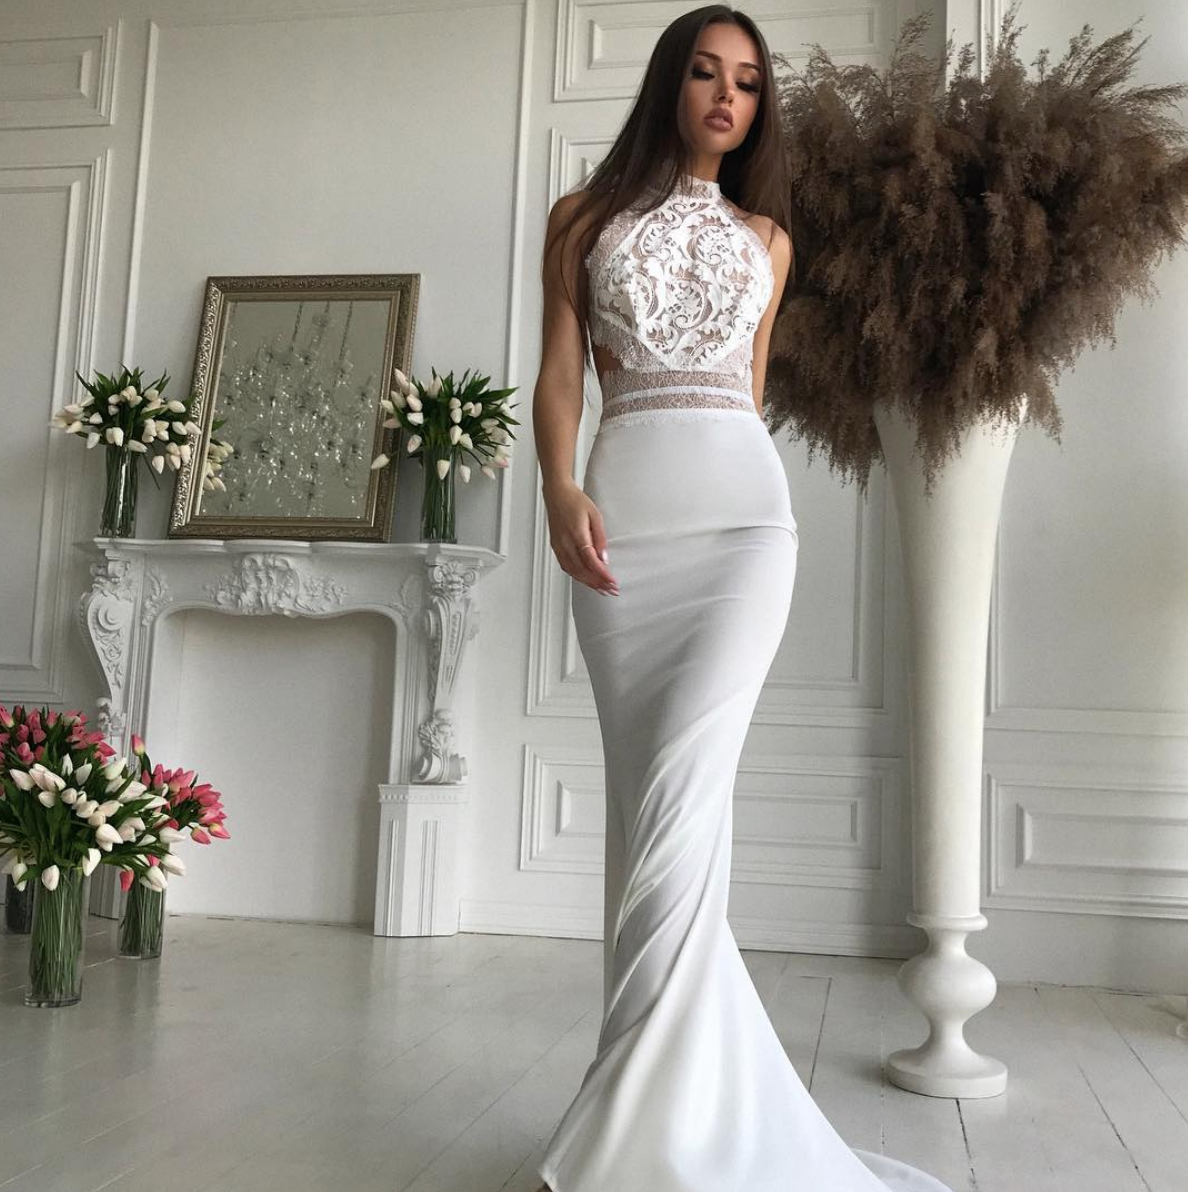 Evening Gown Formal Dress Prom Dress Maxi Dresses Unique